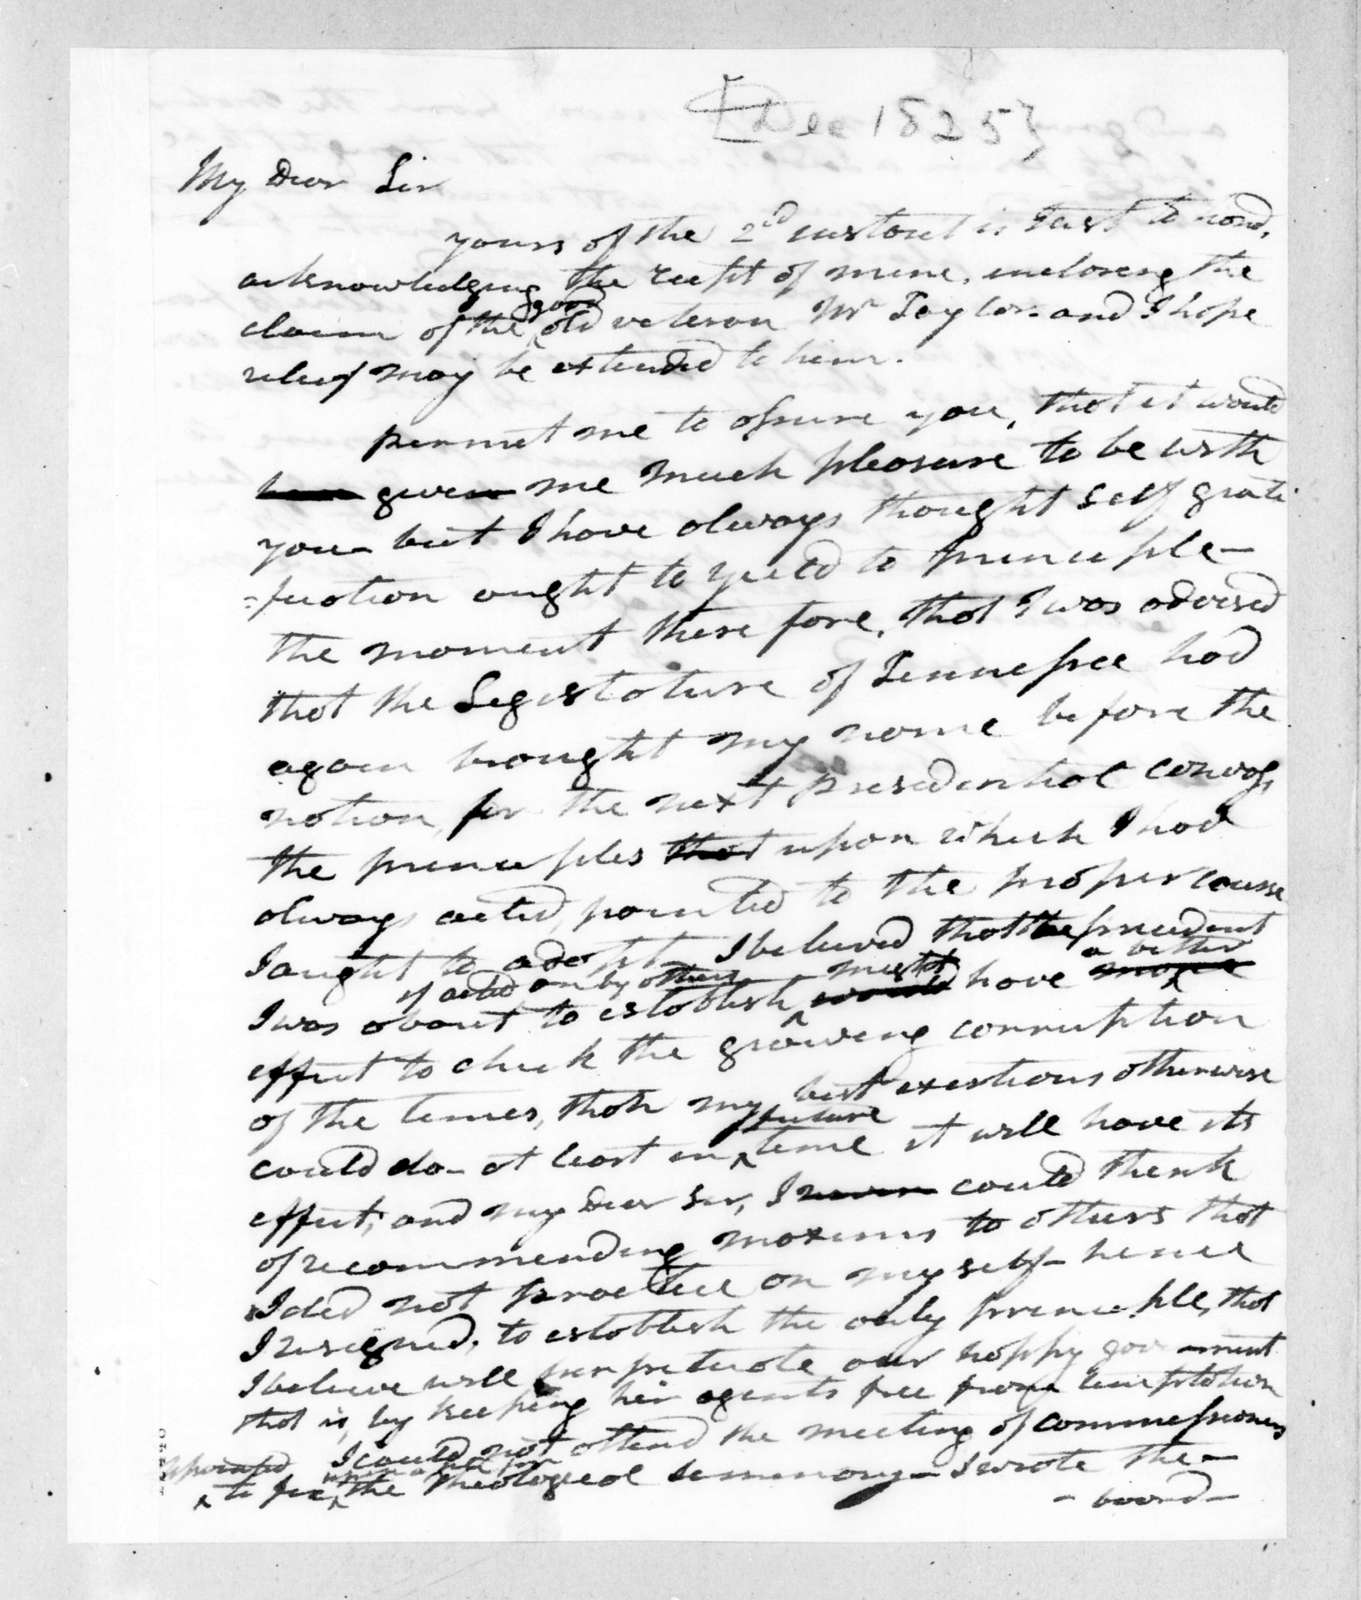 Andrew Jackson to Richard Mentor Johnson